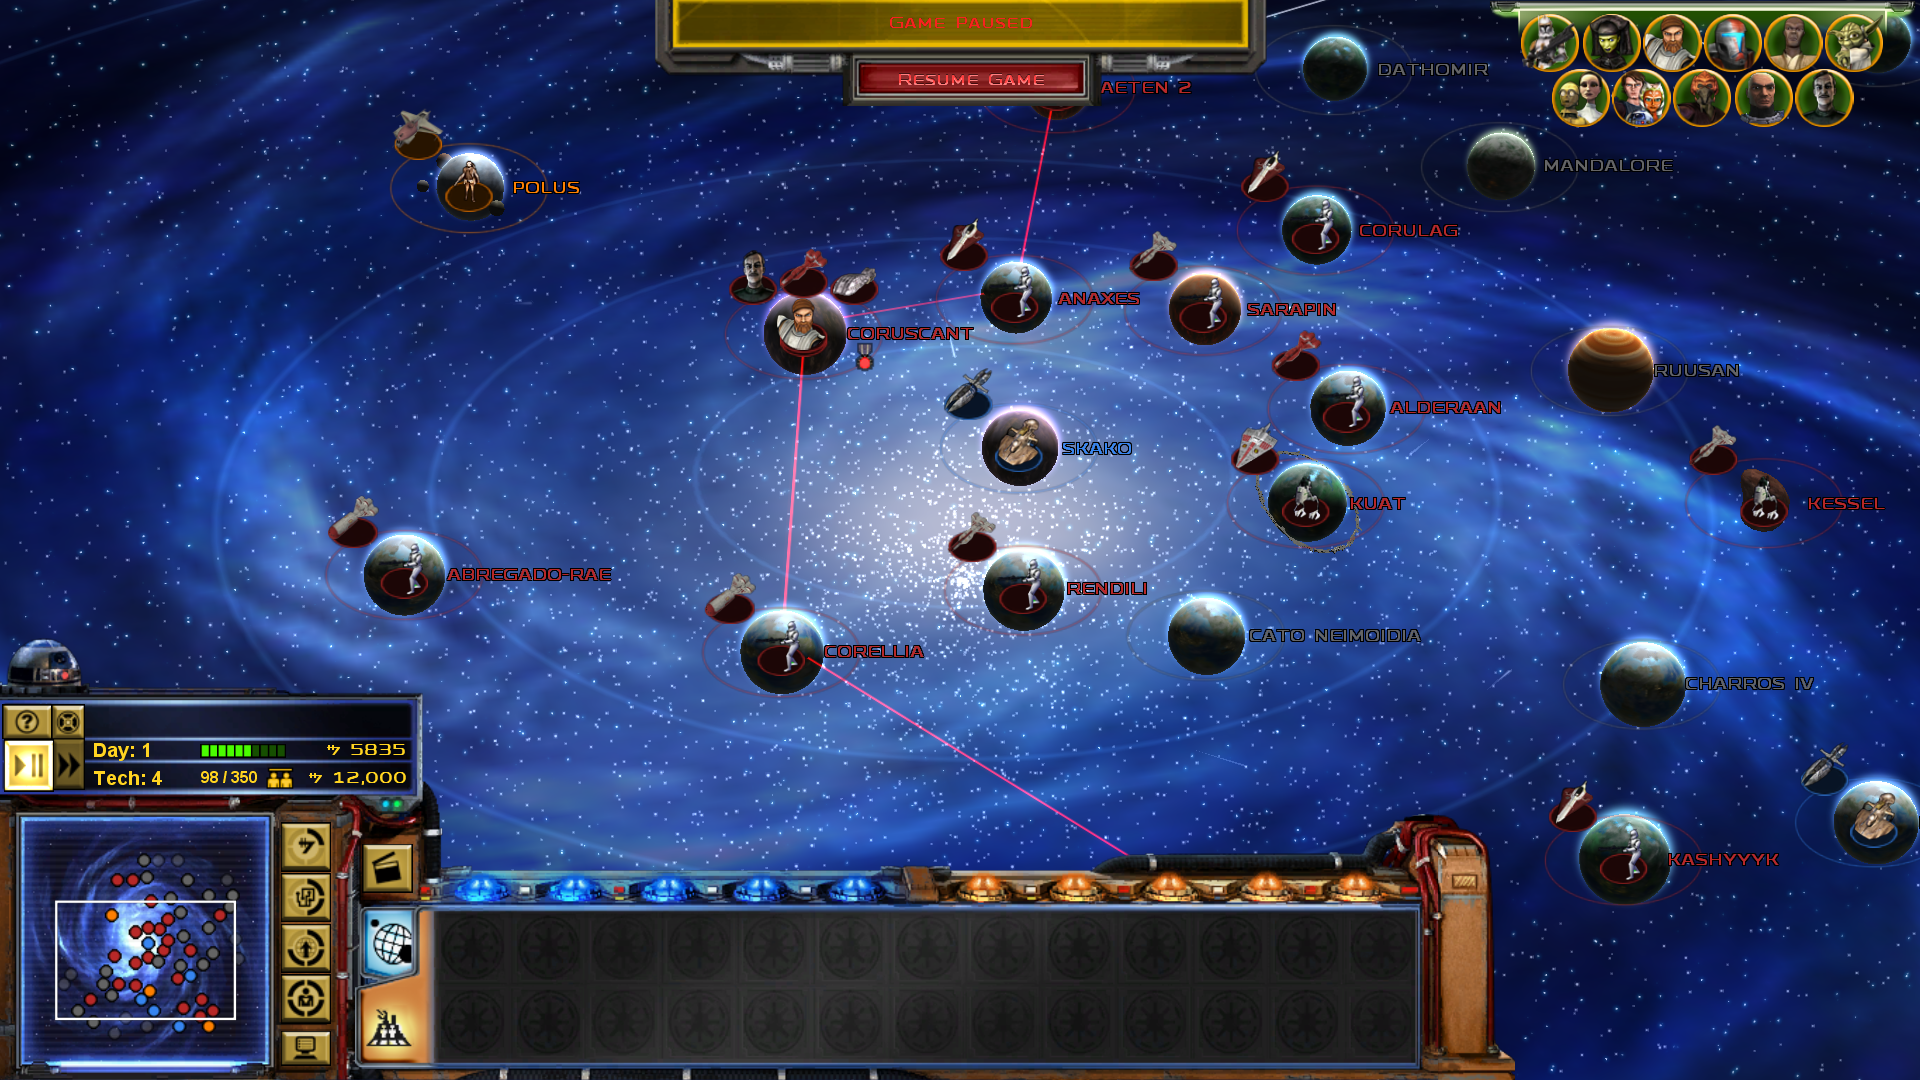 Galaxy image star wars clone wars mod for star wars empire at war